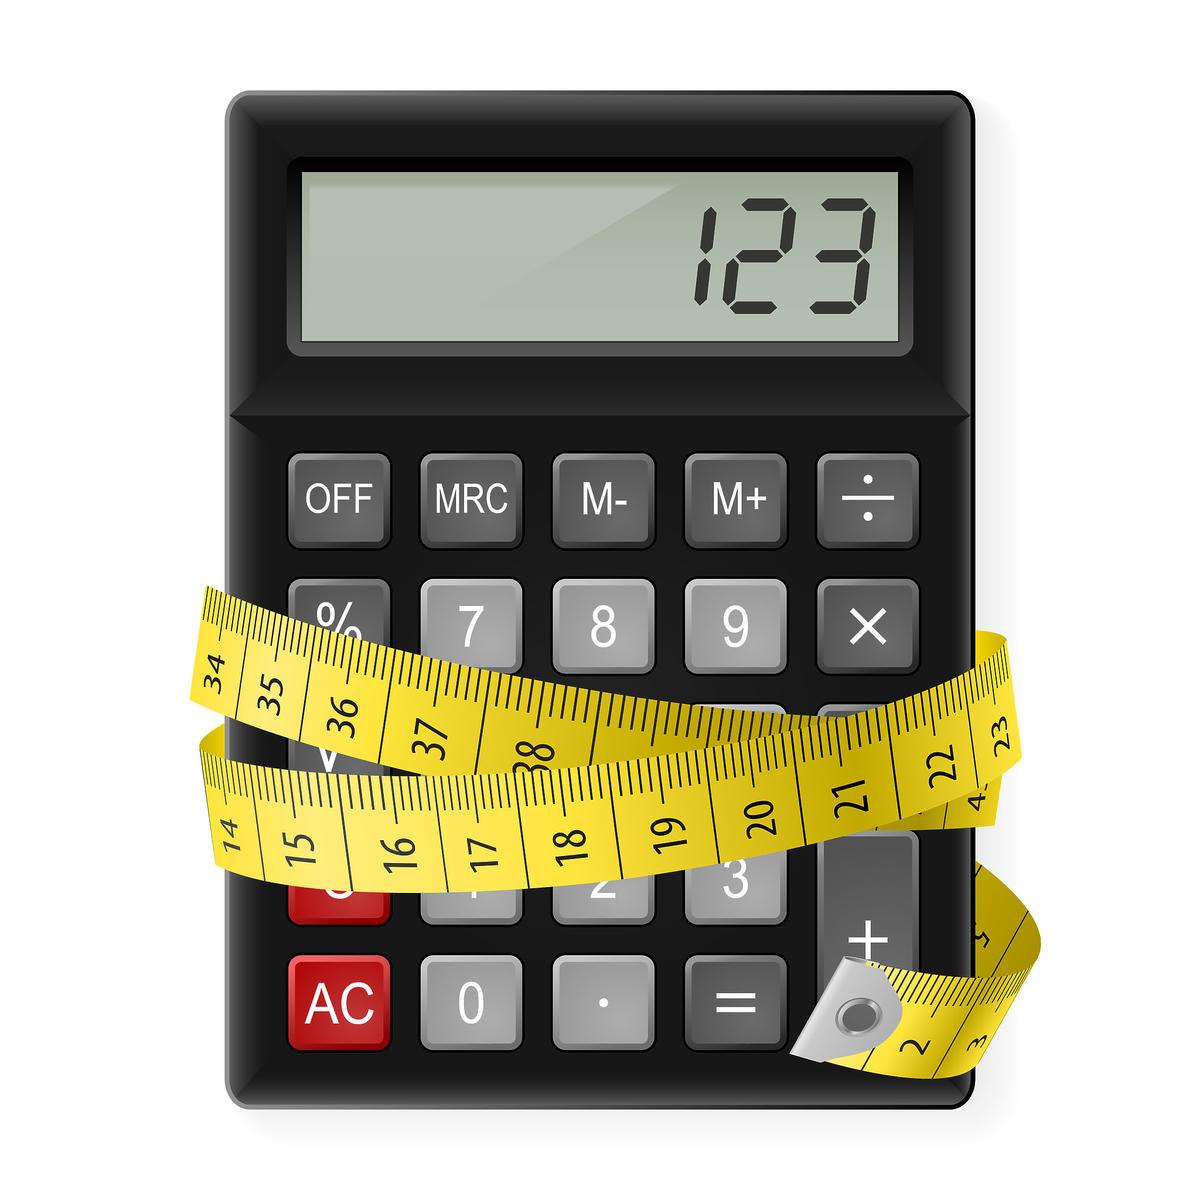 Kalkulator kalorii zeby schudnąć